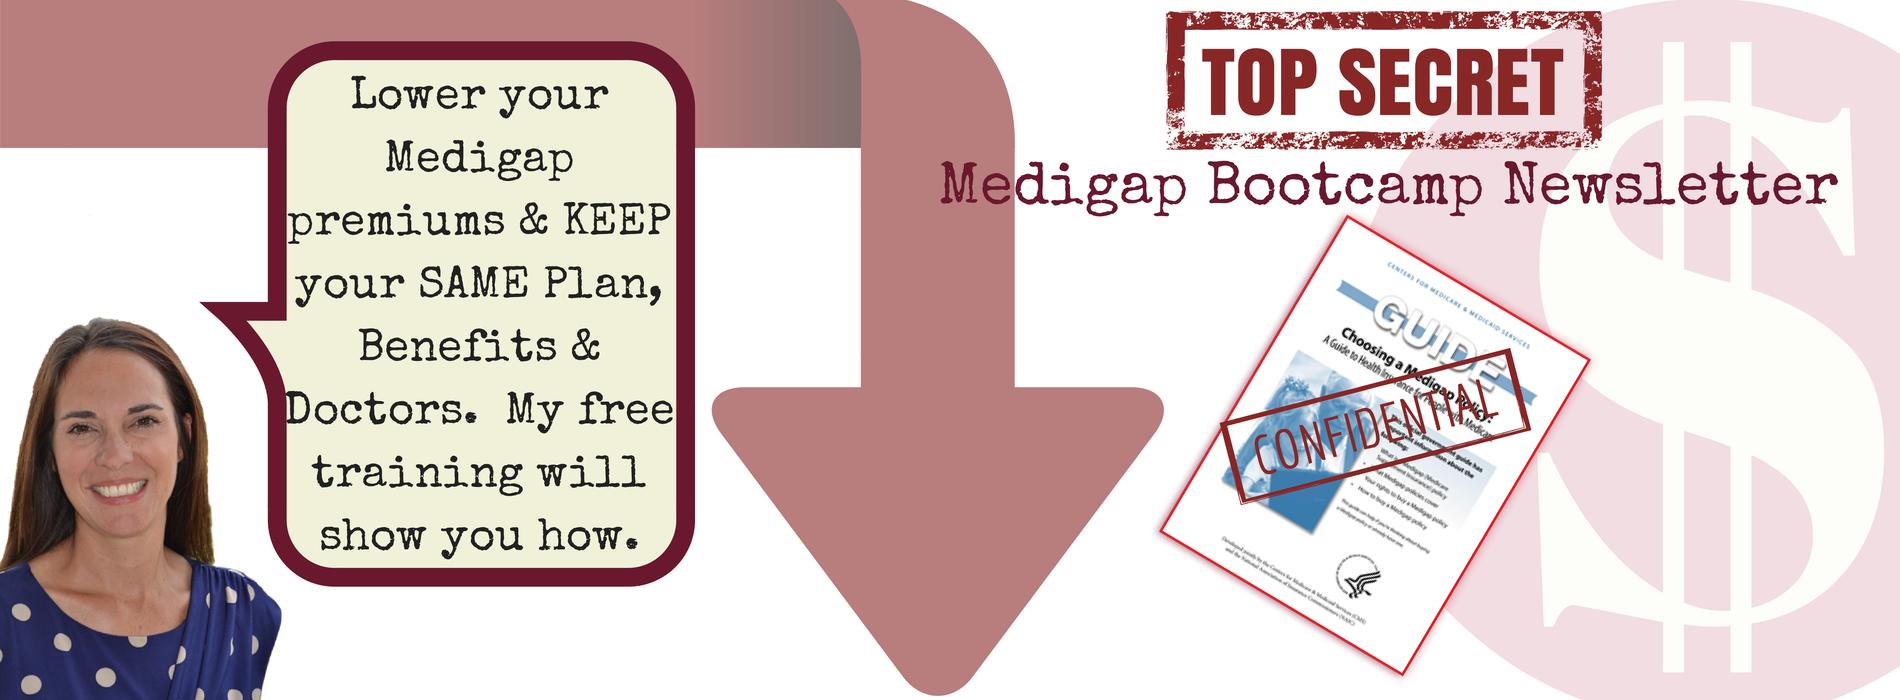 lowest medigap rates